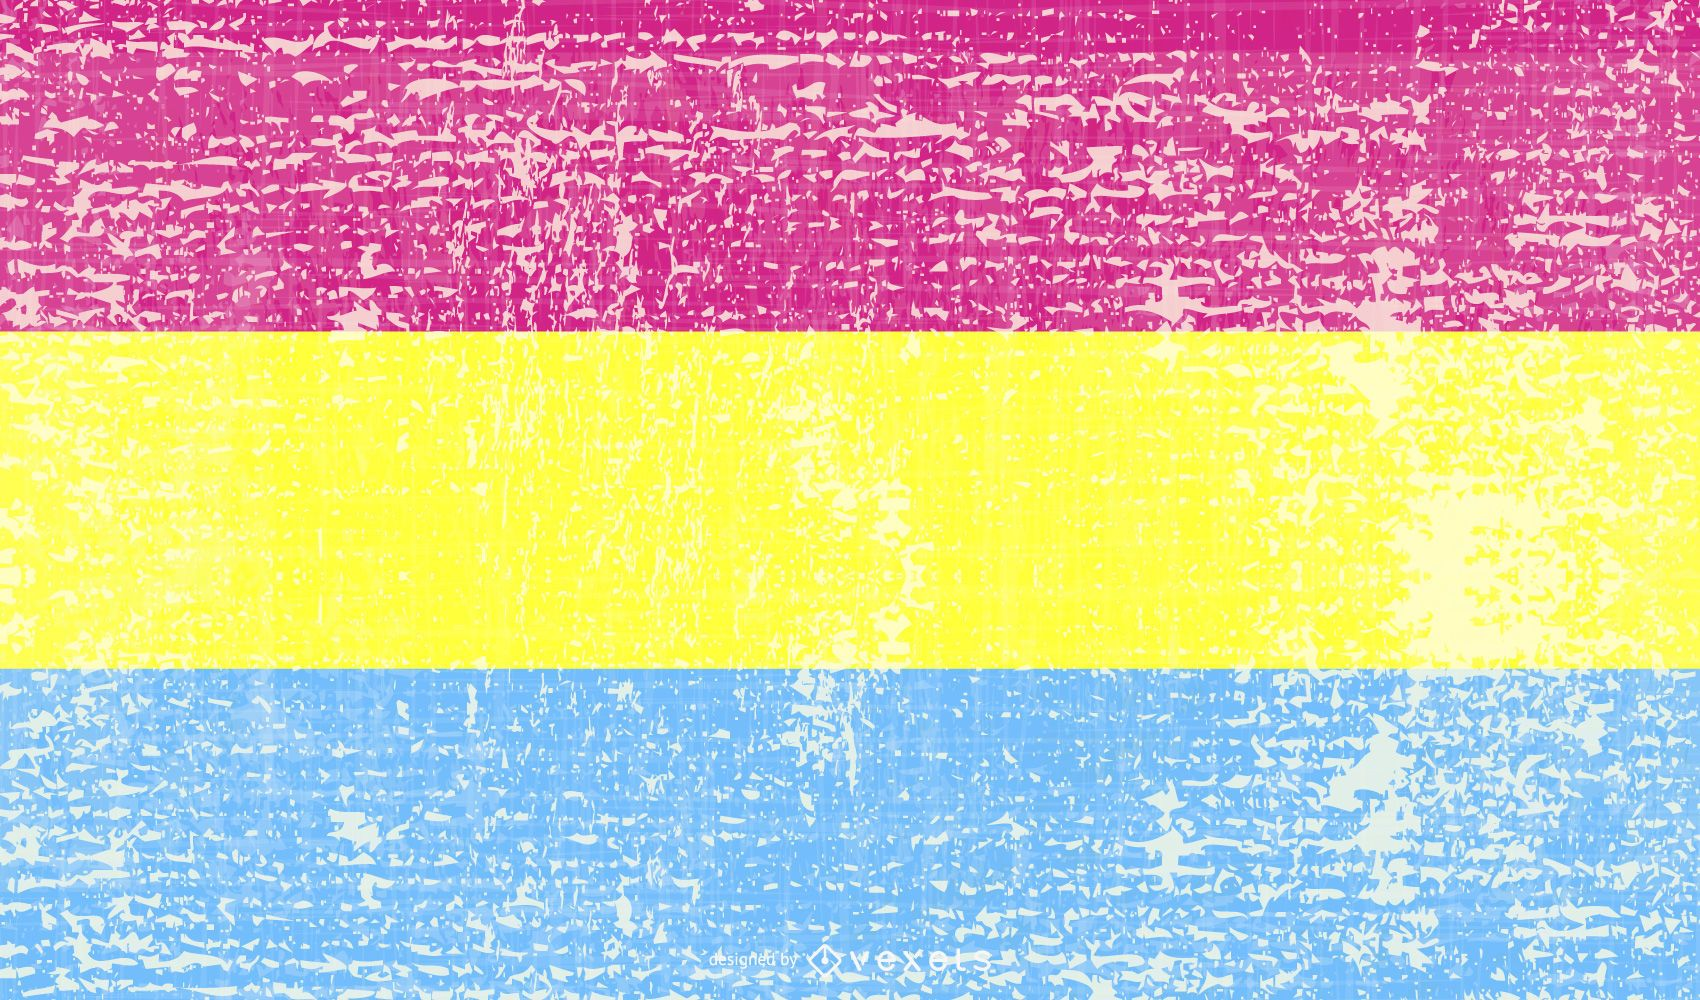 Grunge da bandeira do orgulho pansexual